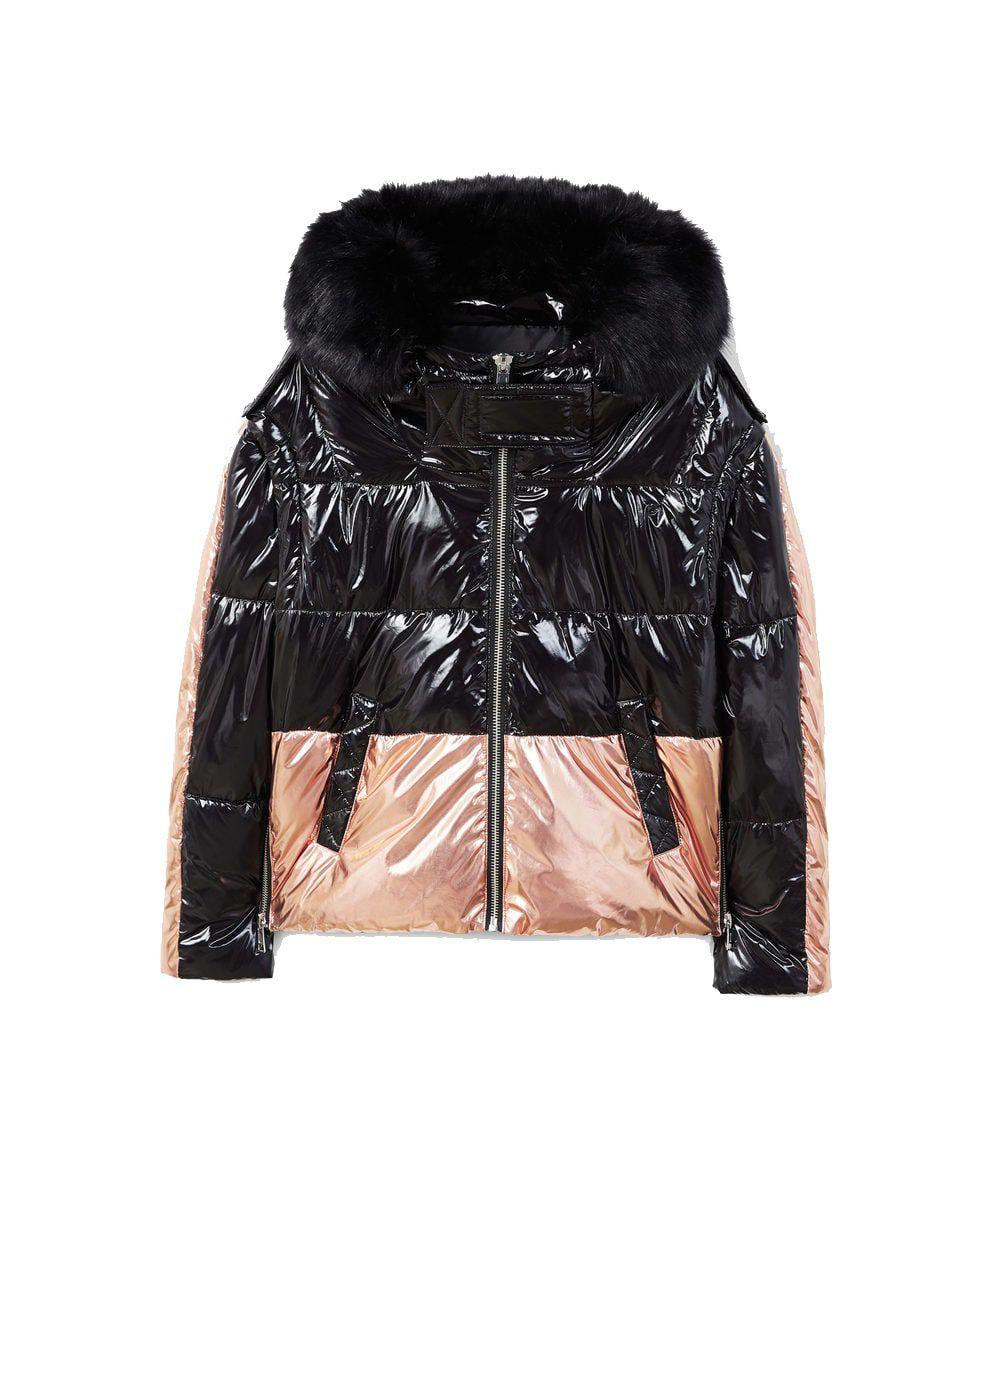 estilo de afrontar abrigos el con plumas frío 51 para baratos ZzOBanOqU